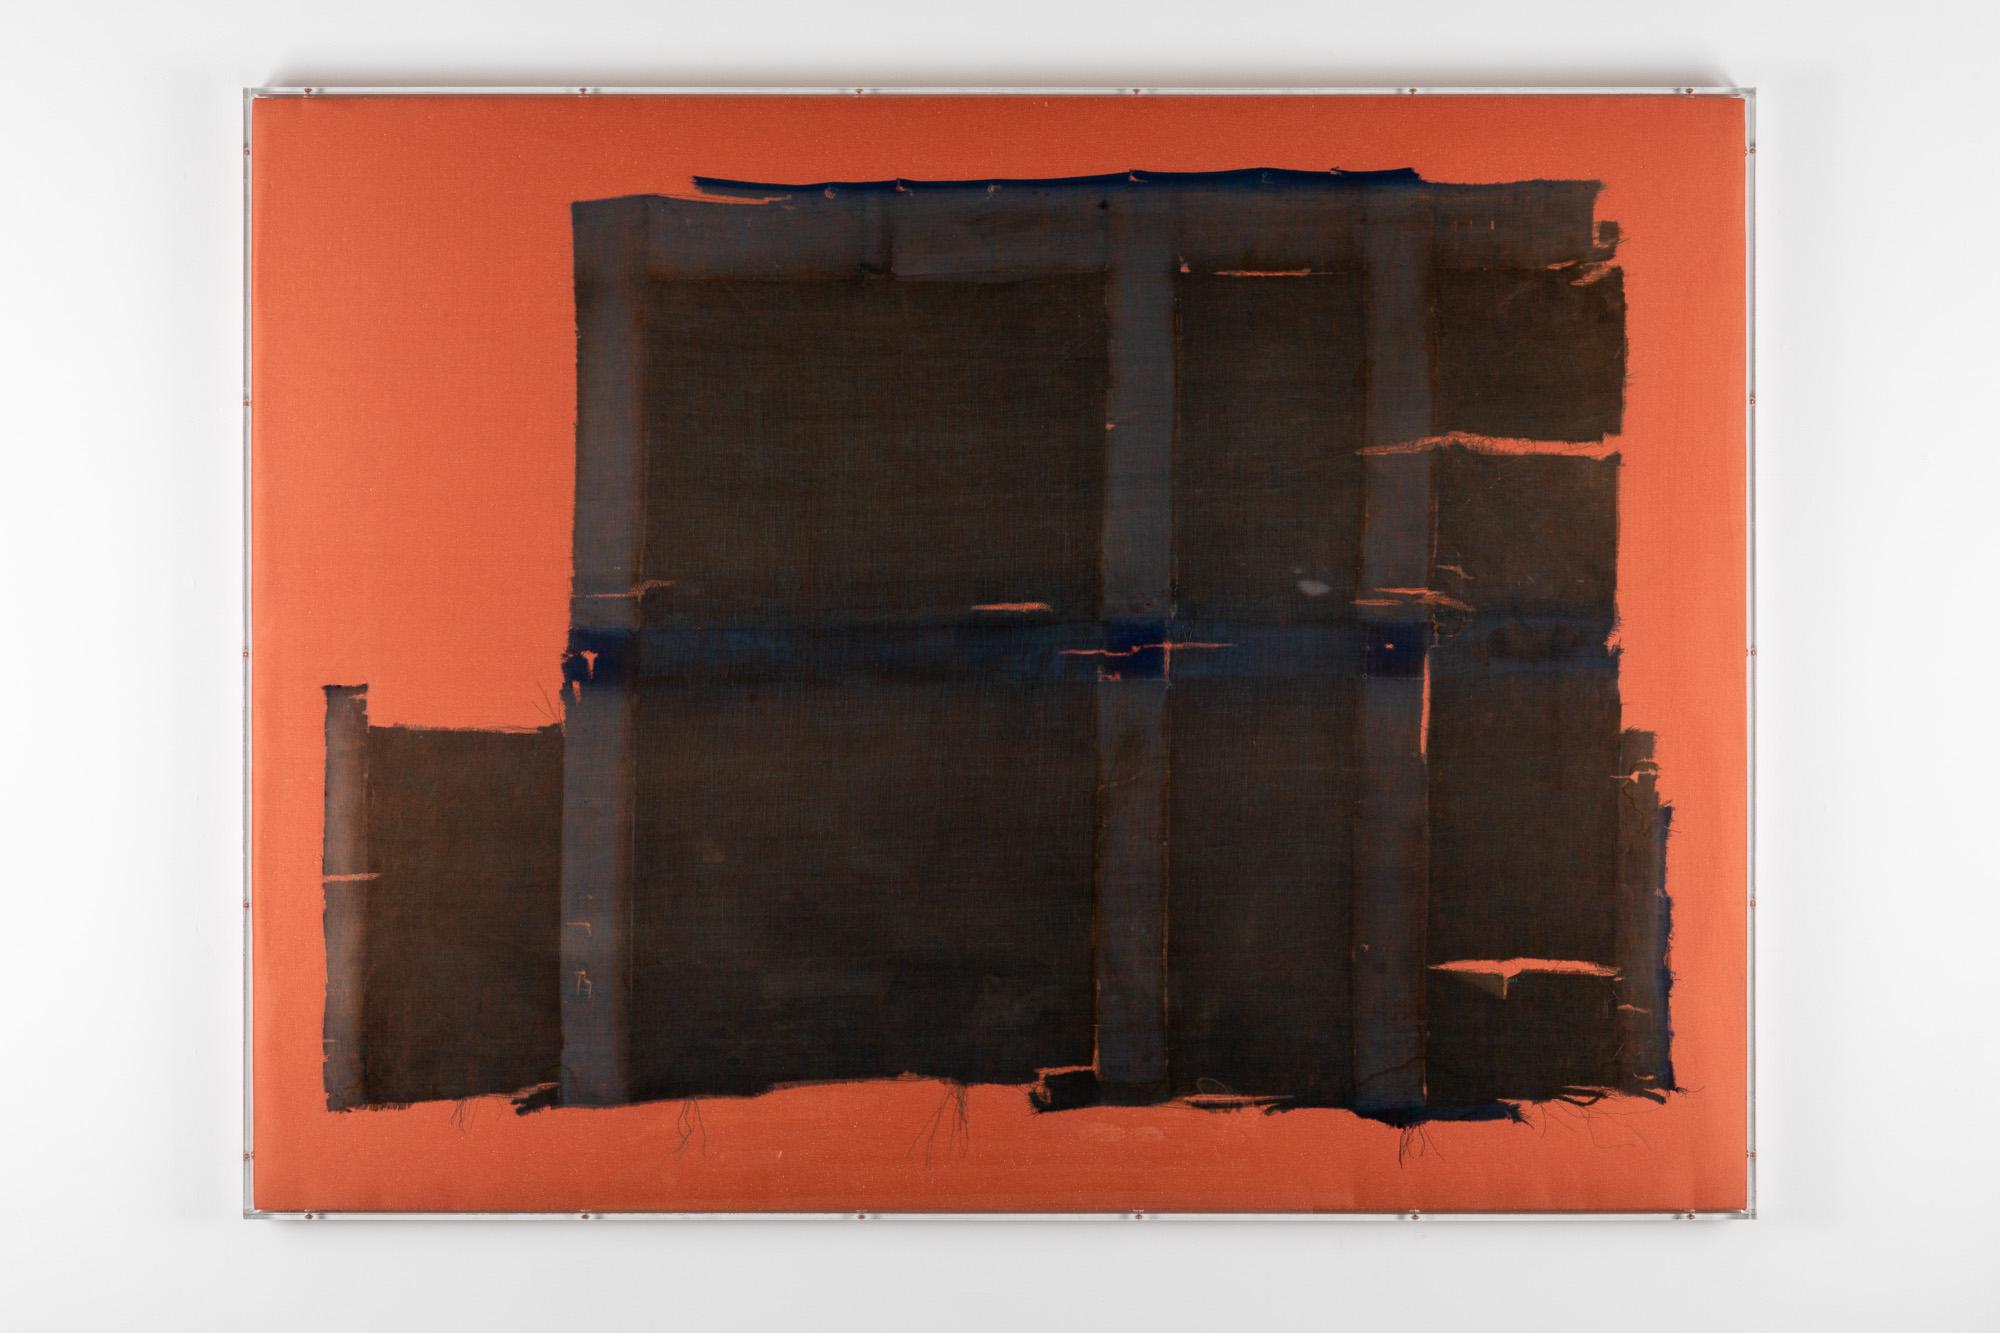 Minimal Information Peach Piano, 2020. Textiles in artist's frame (plexiglass, wood and aluminum), 110 x 146,5 x 5 cm